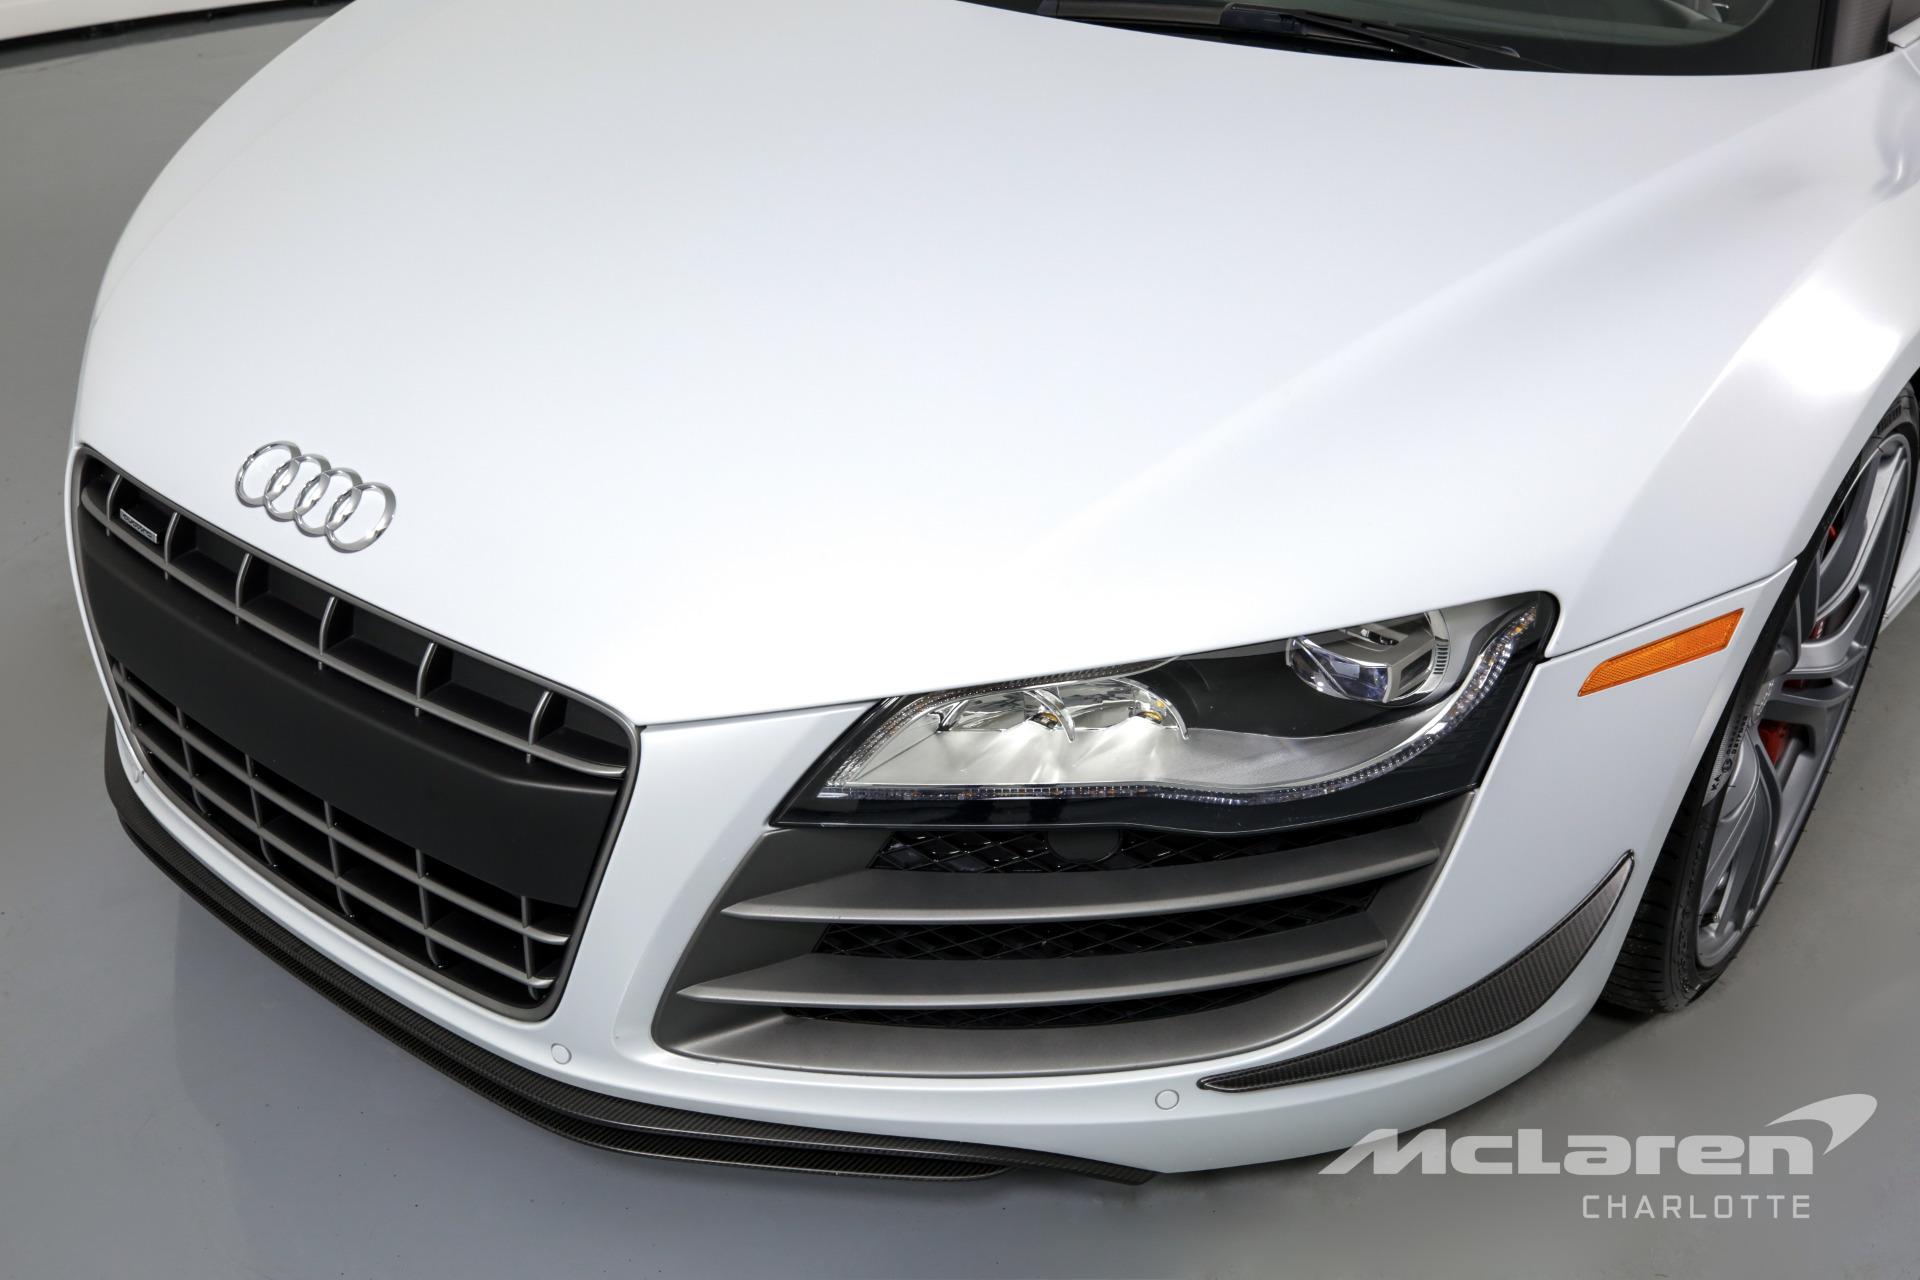 Used 2012 Audi R8 GT 5.2 quattro Spyder | Charlotte, NC